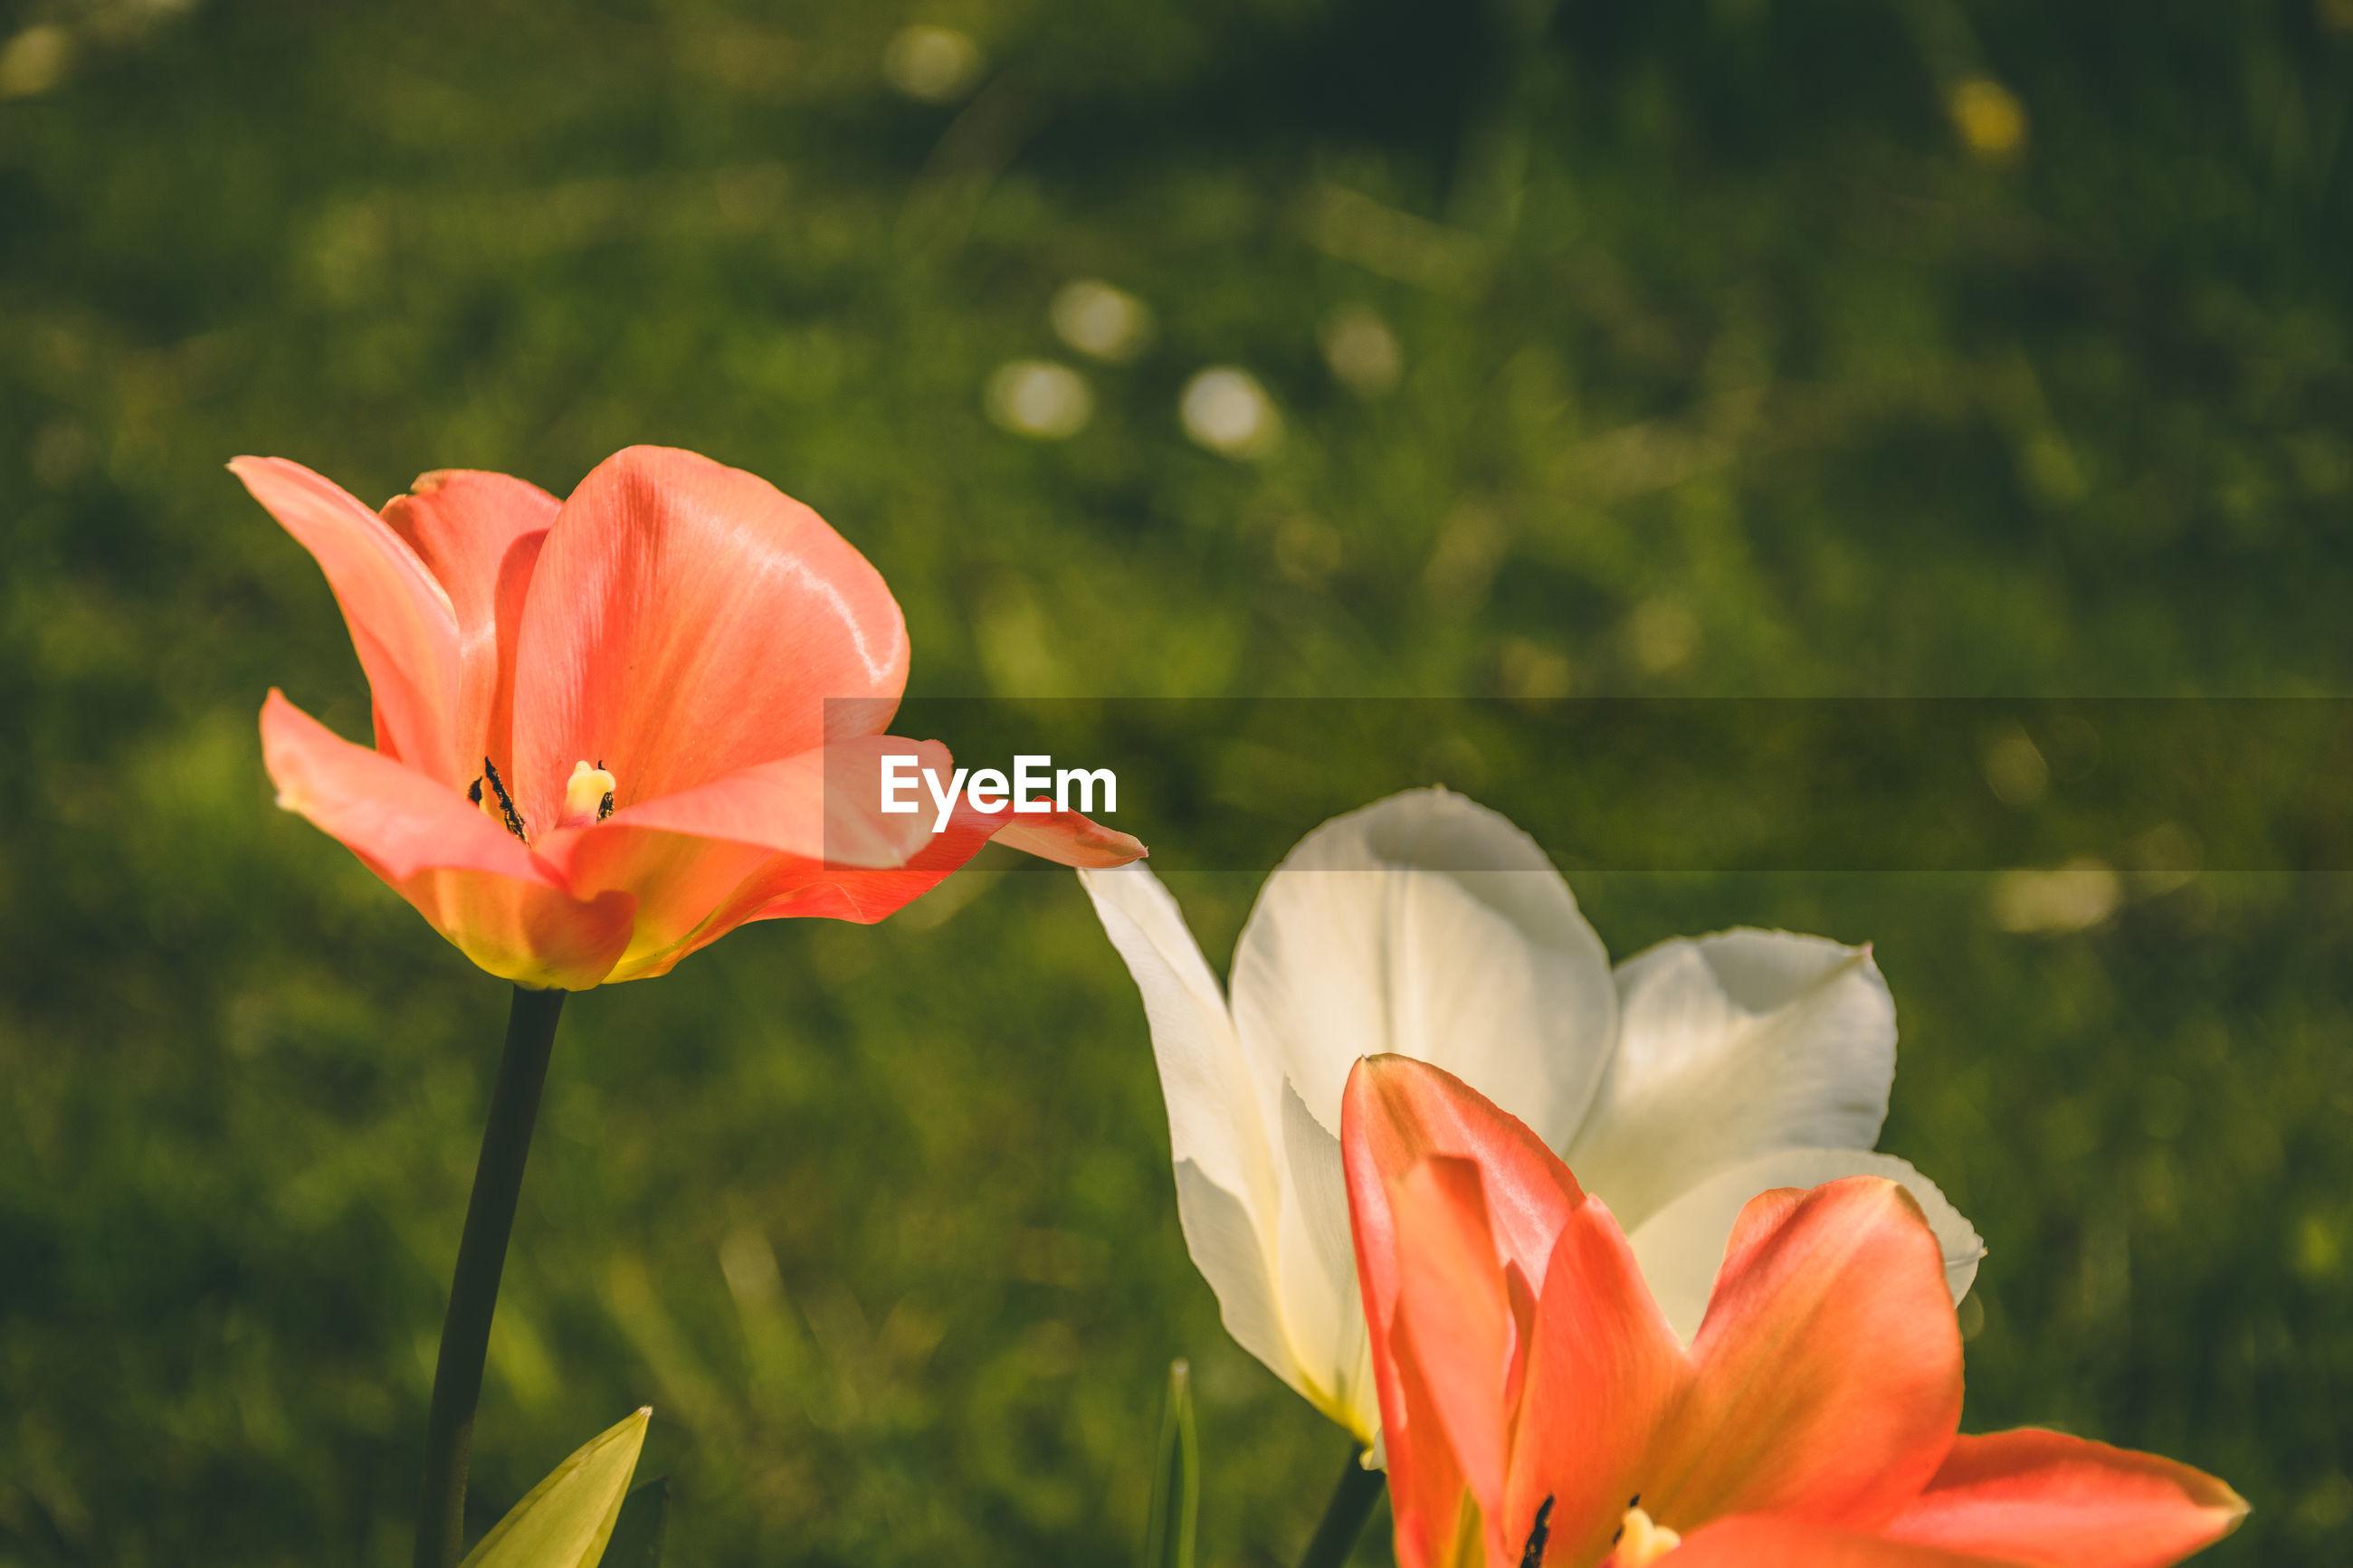 CLOSE-UP OF ORANGE ROSE FLOWER ON FIELD